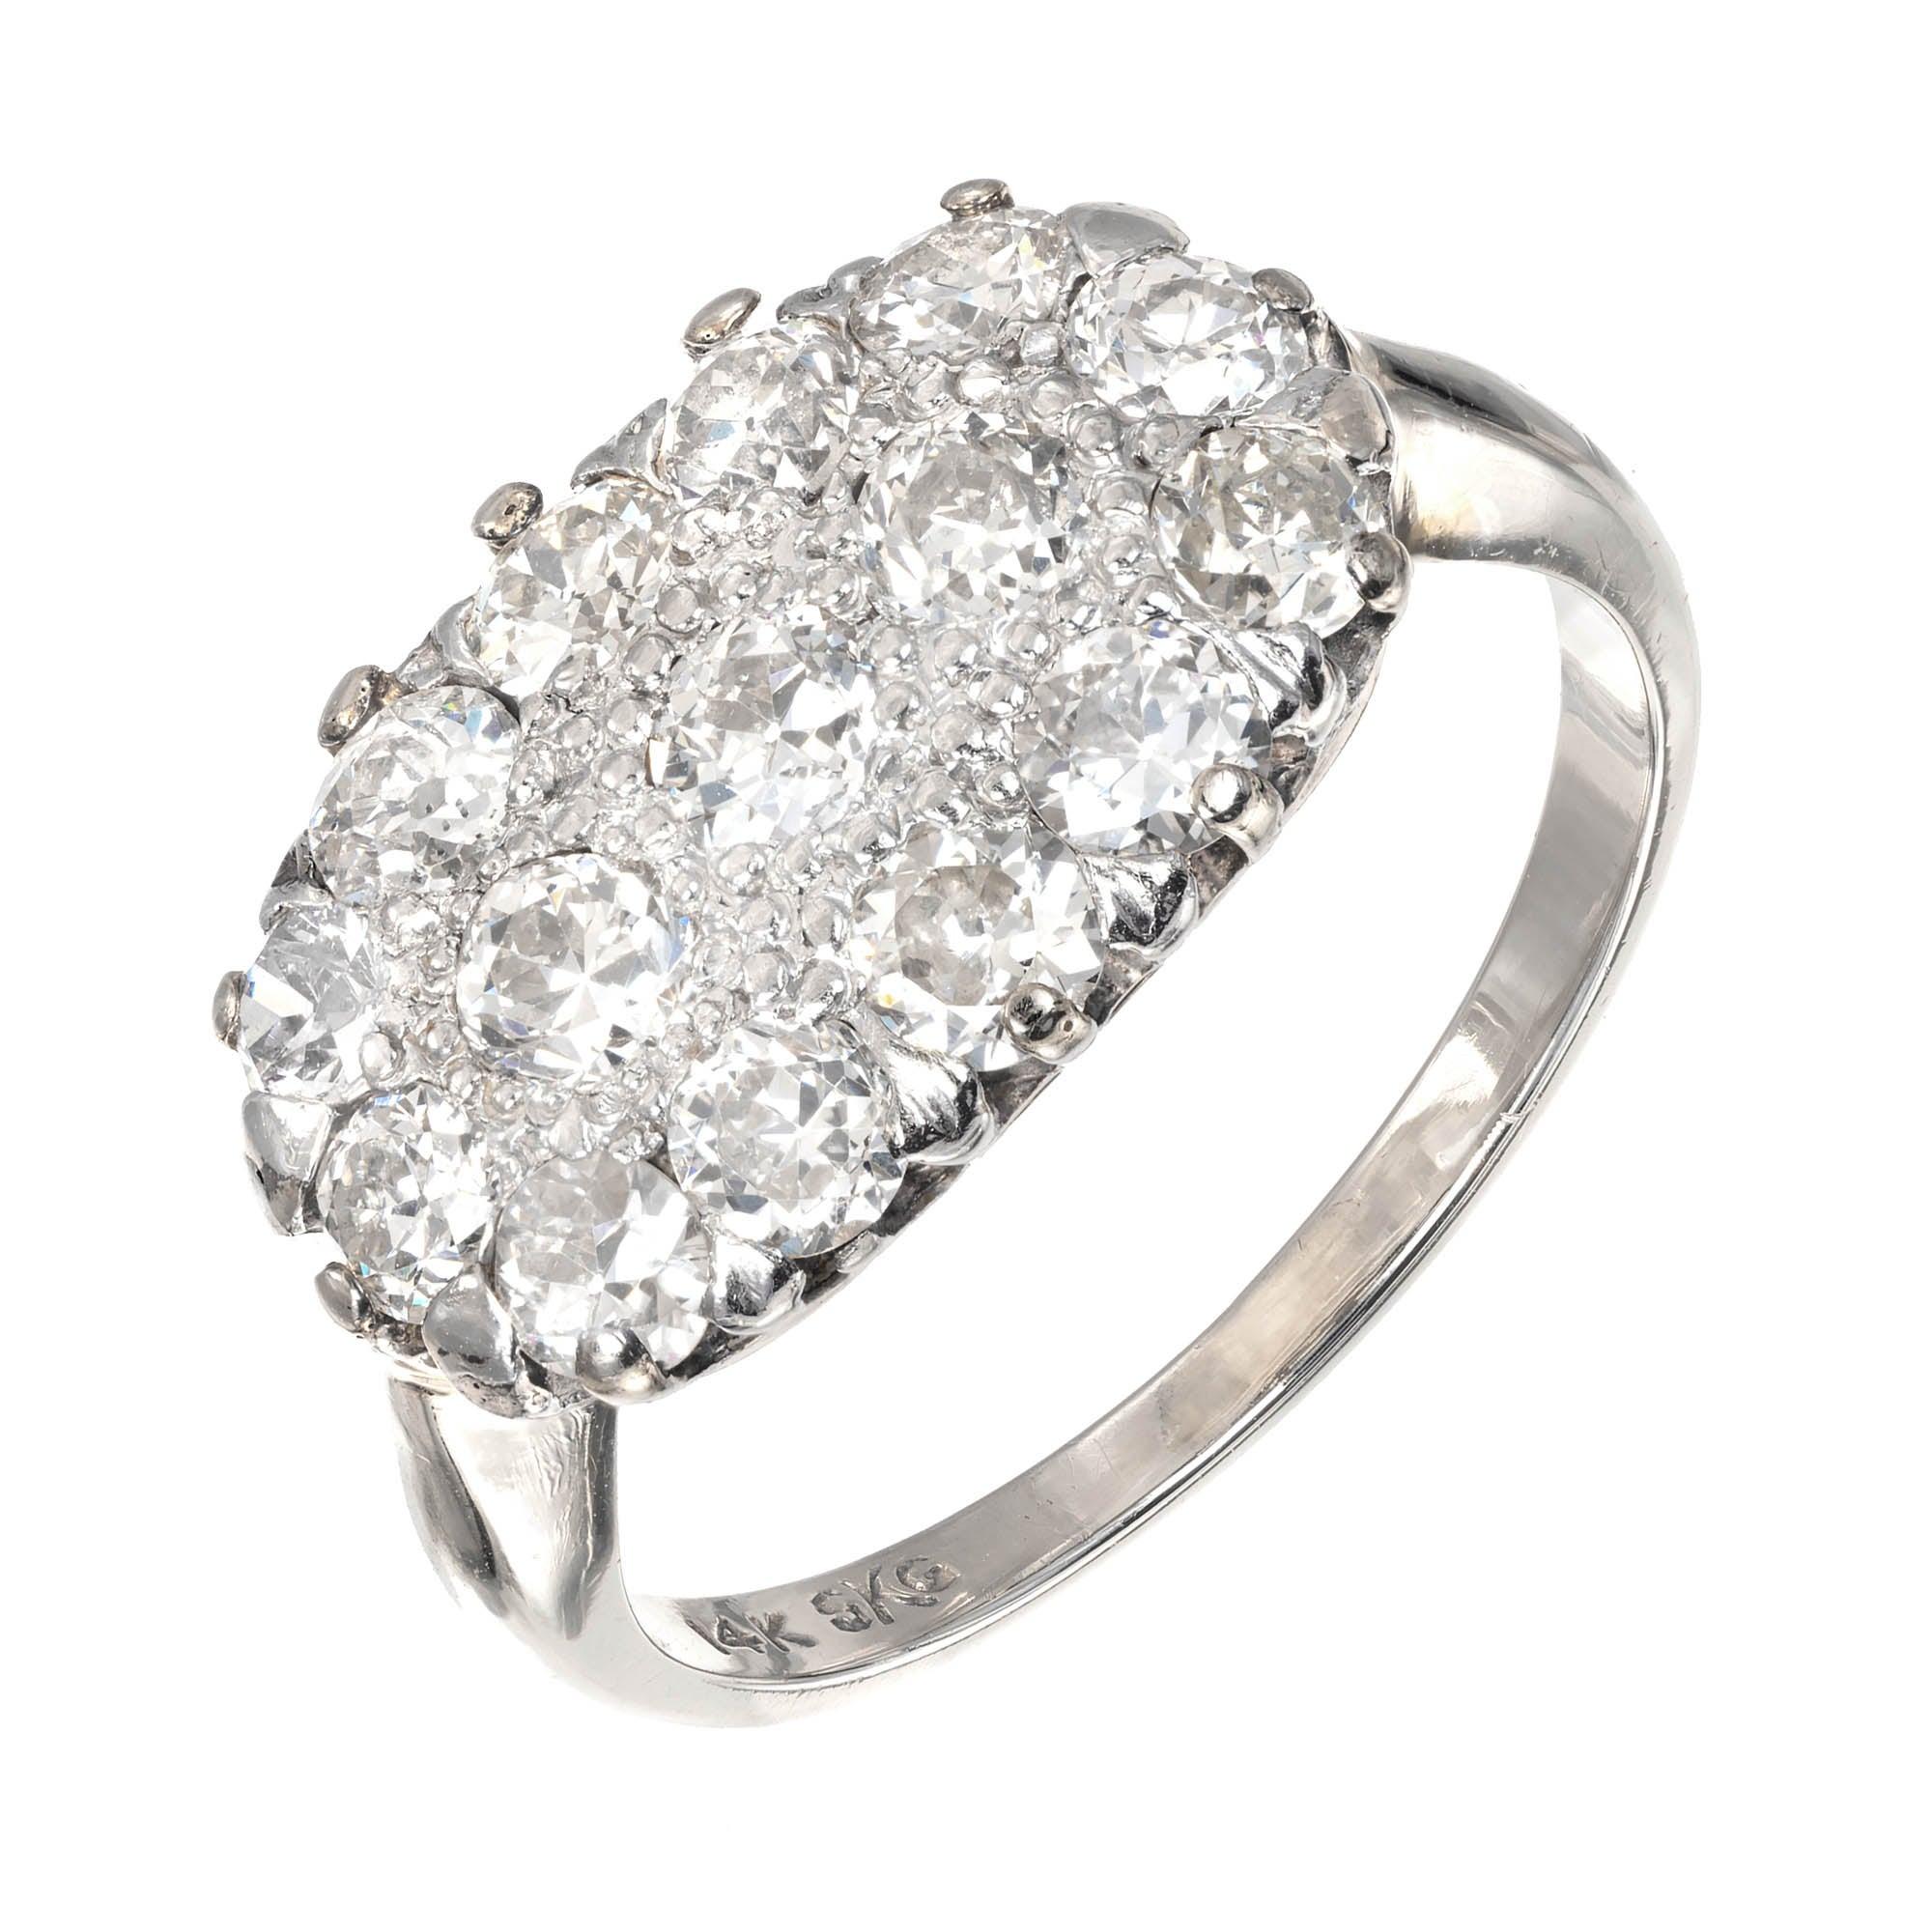 1.50 Carat Diamond White Gold Cluster Cocktail Ring